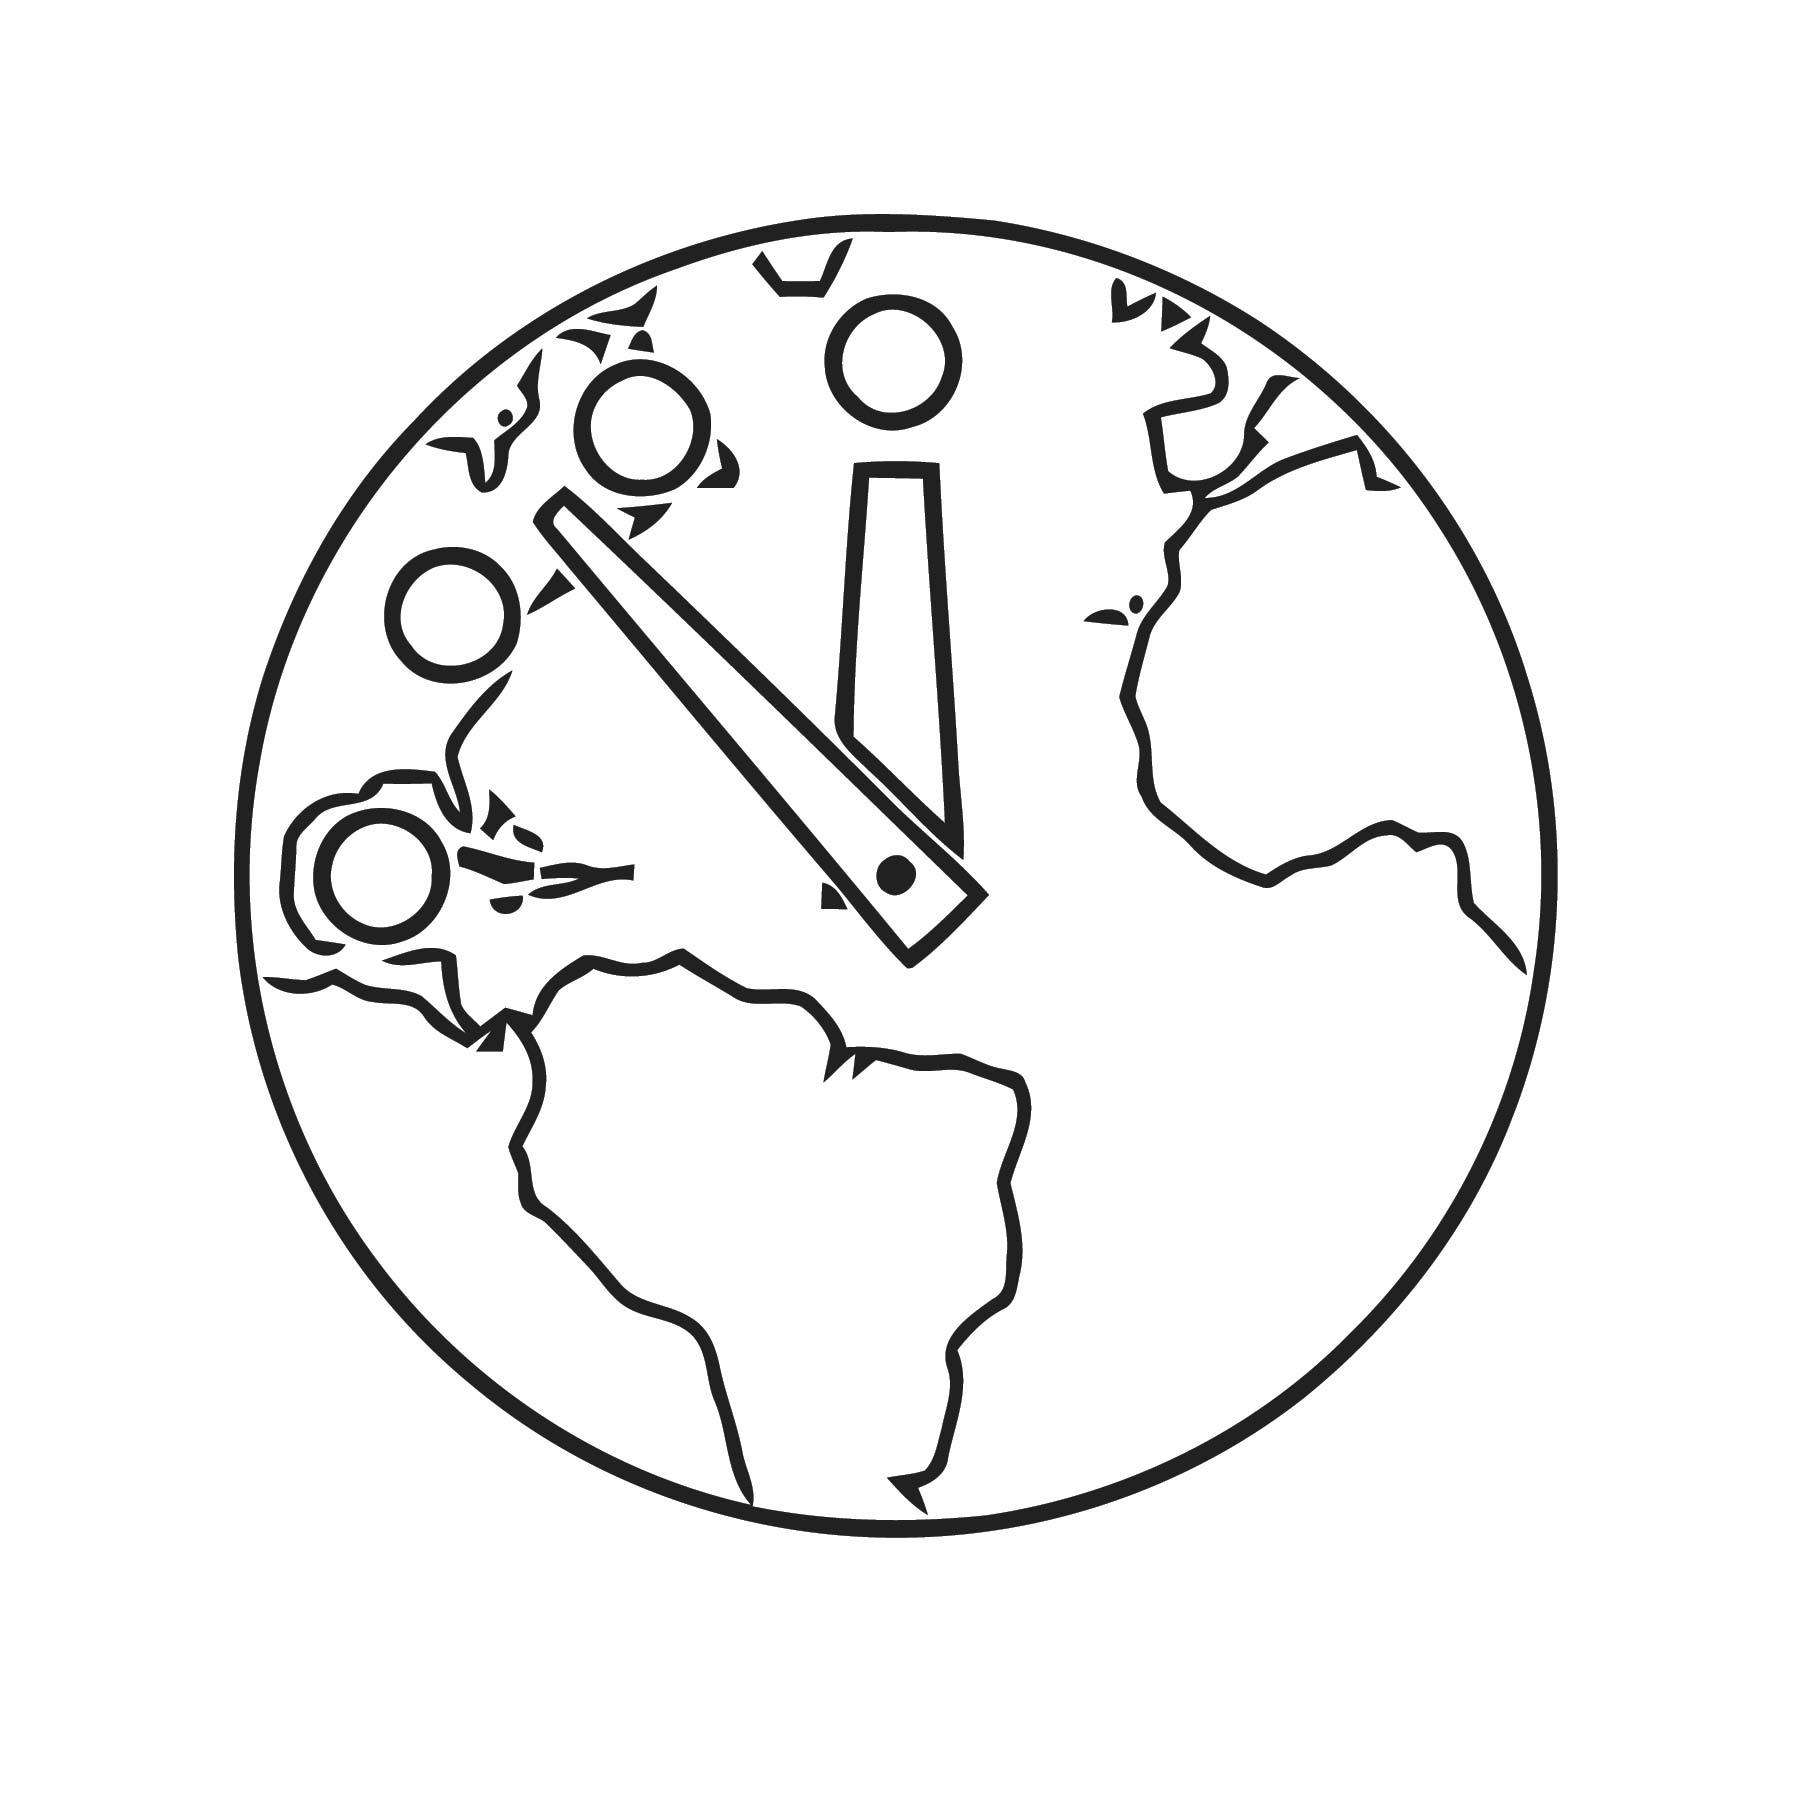 Orologio Apocalis Free Printable Se Cartoonized Free Printable Coloring Page